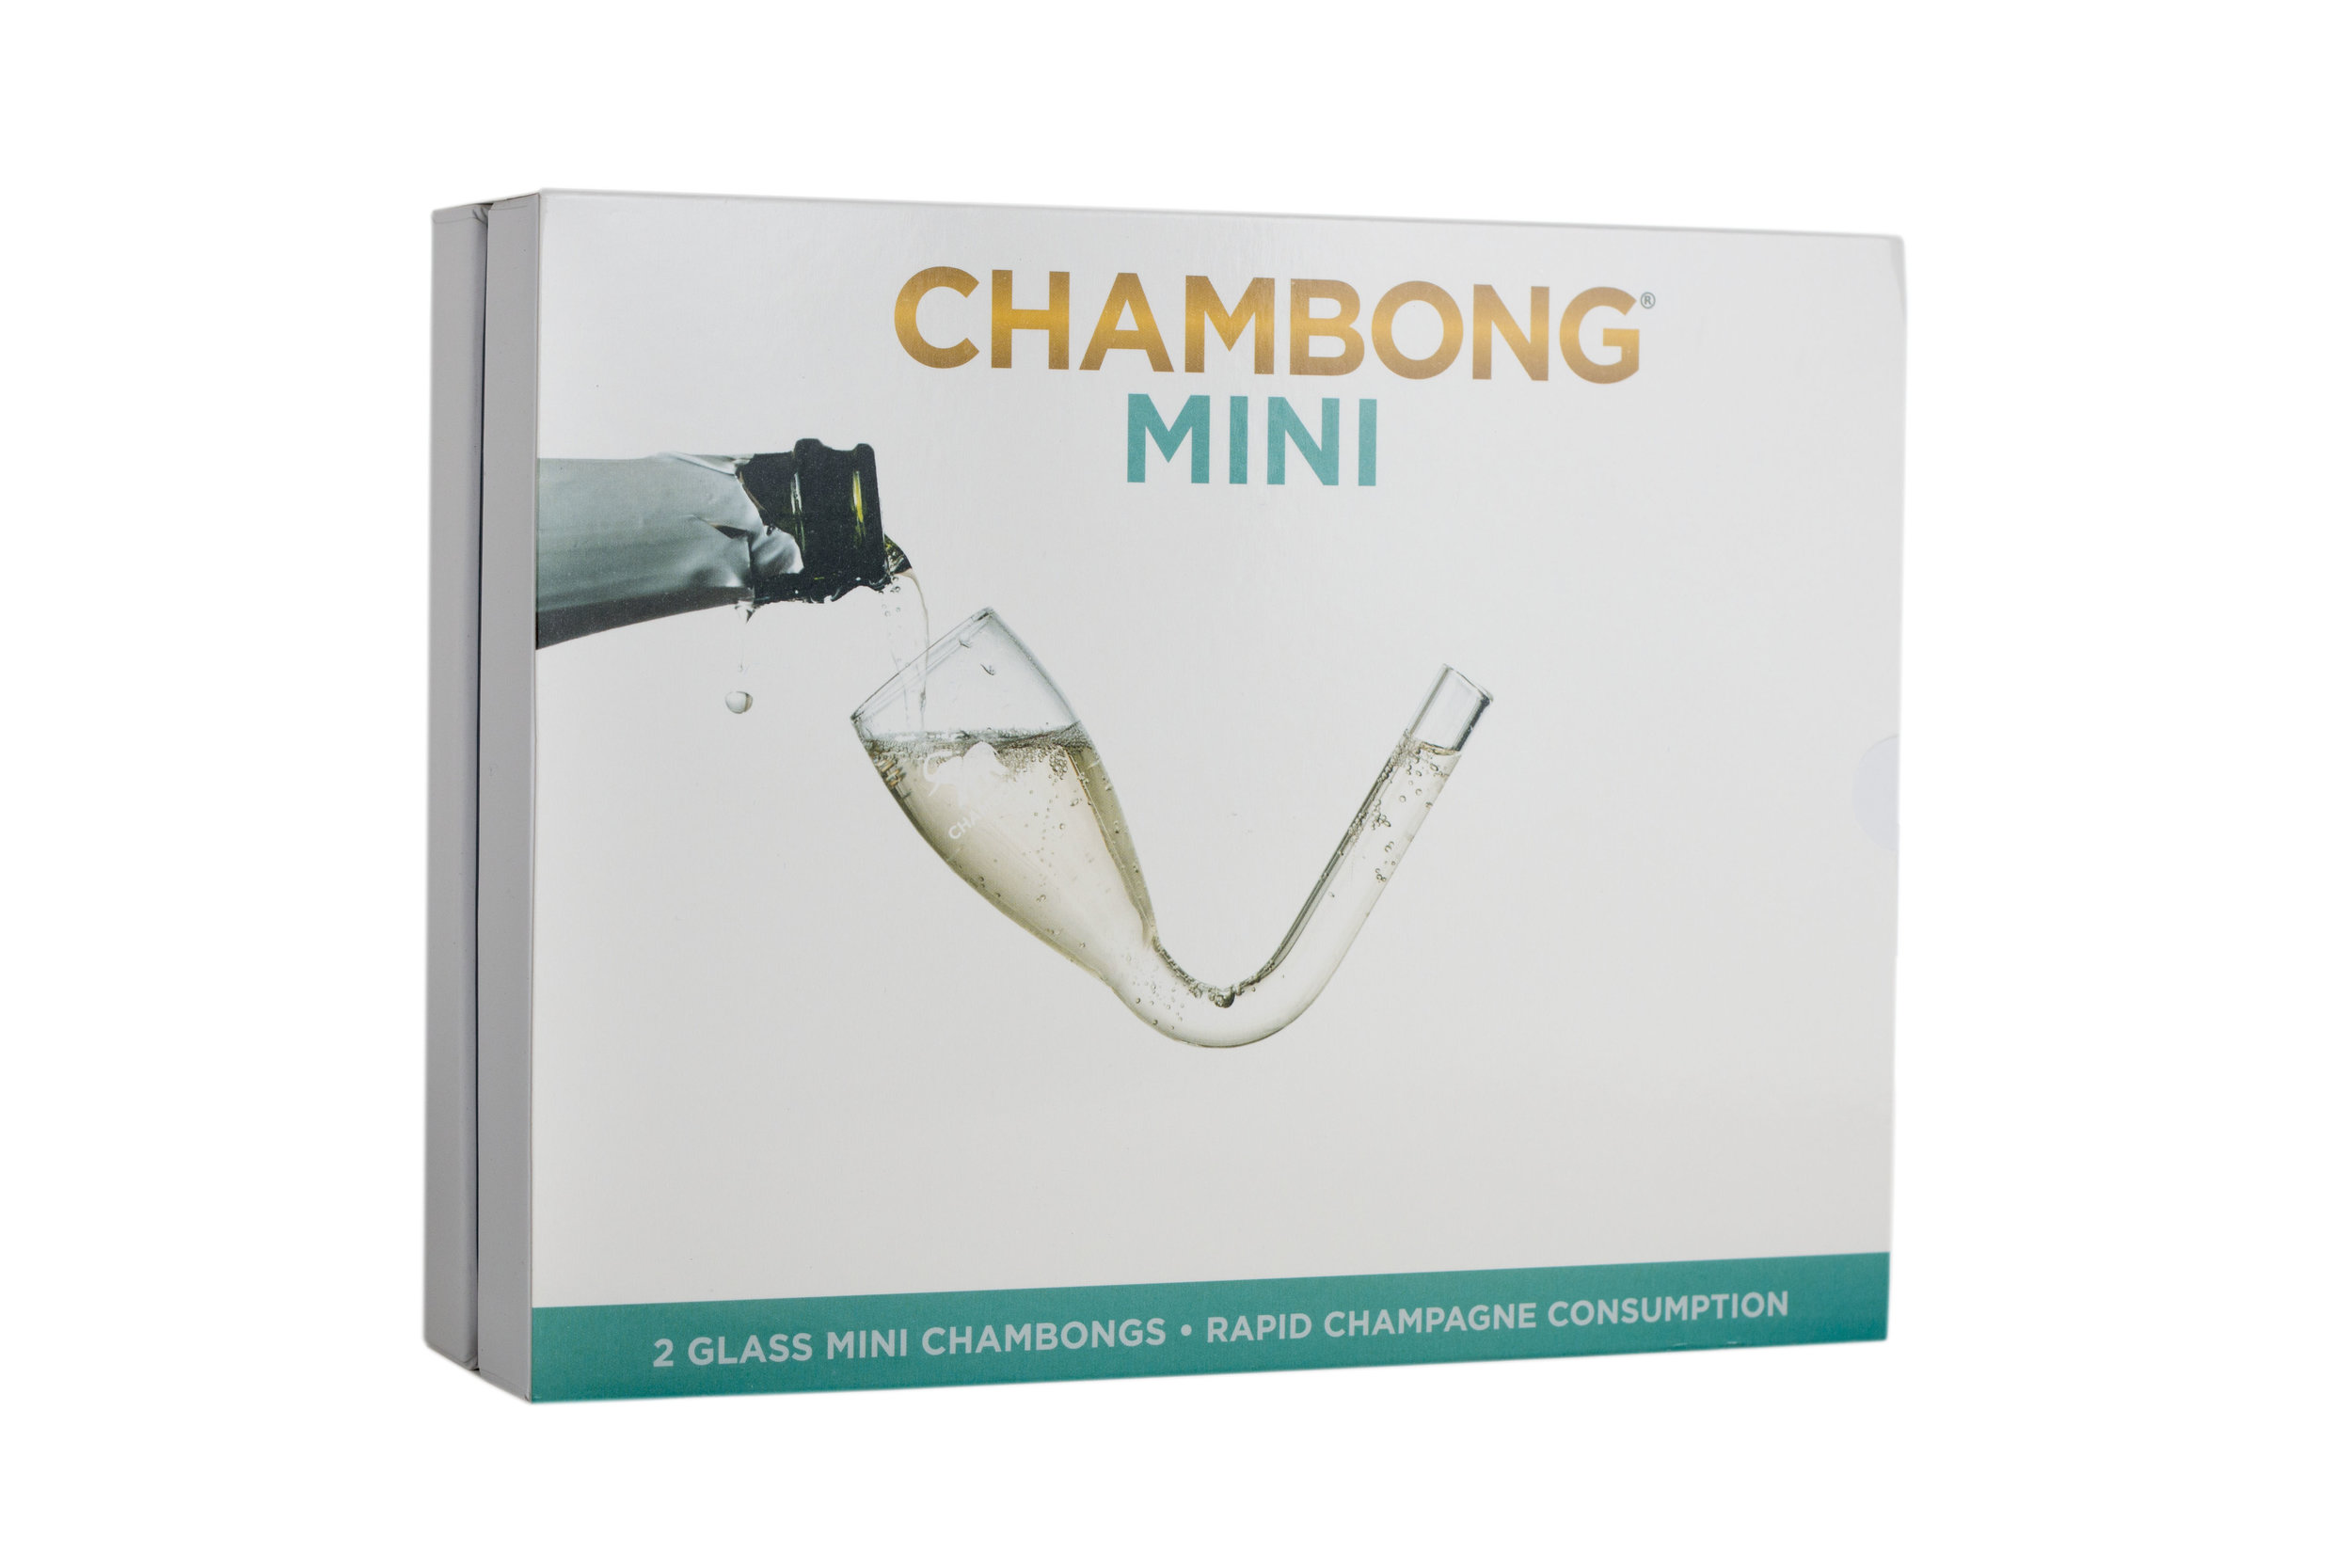 Chambong Mini